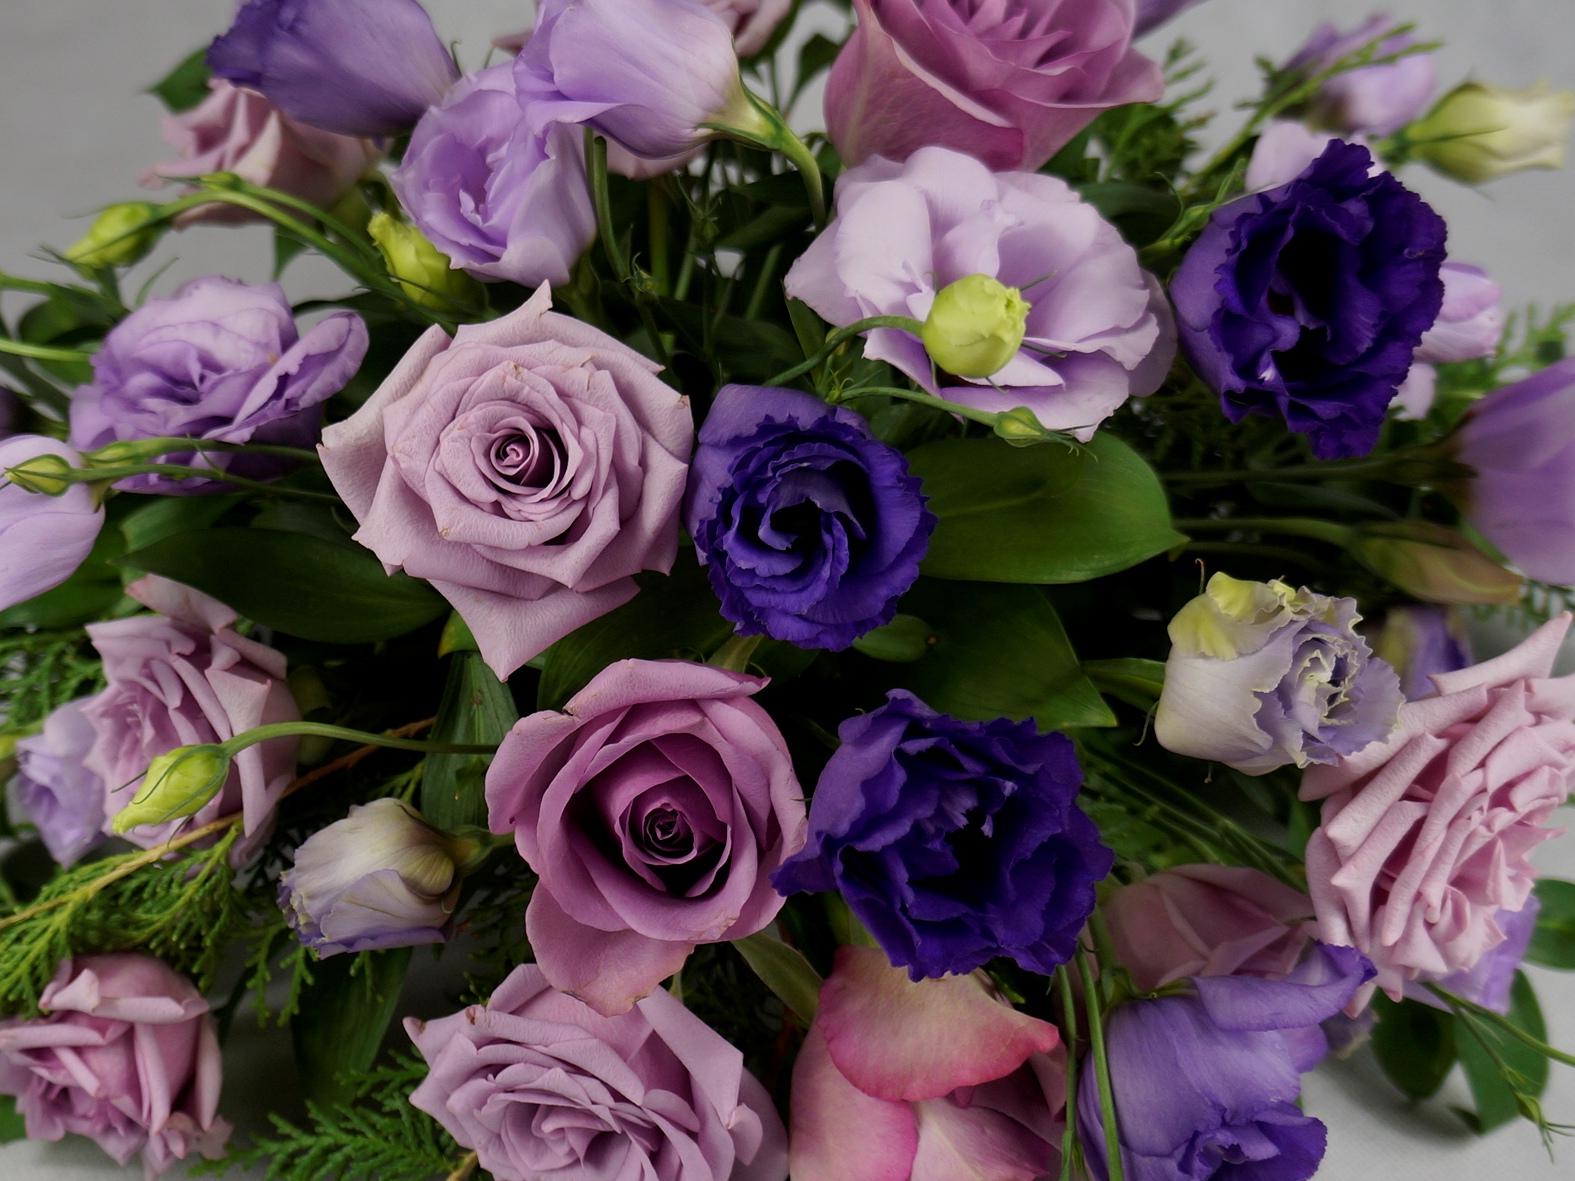 виолетово и лилаво